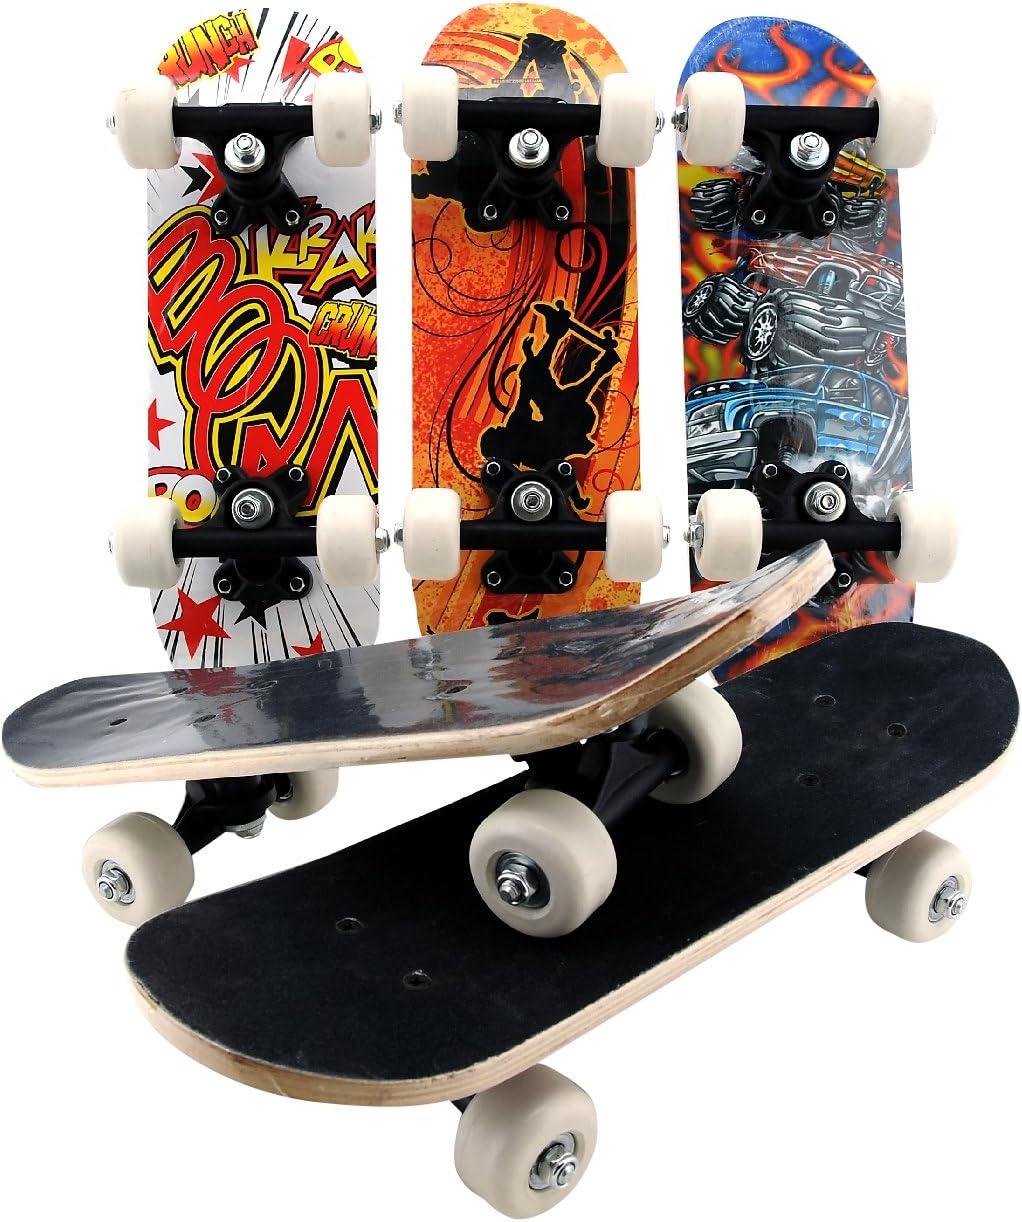 Globo Toys Globo 36715 43 x 13 x 1.1 cm 5 Assorted Summer China Maple Mini Skateboard